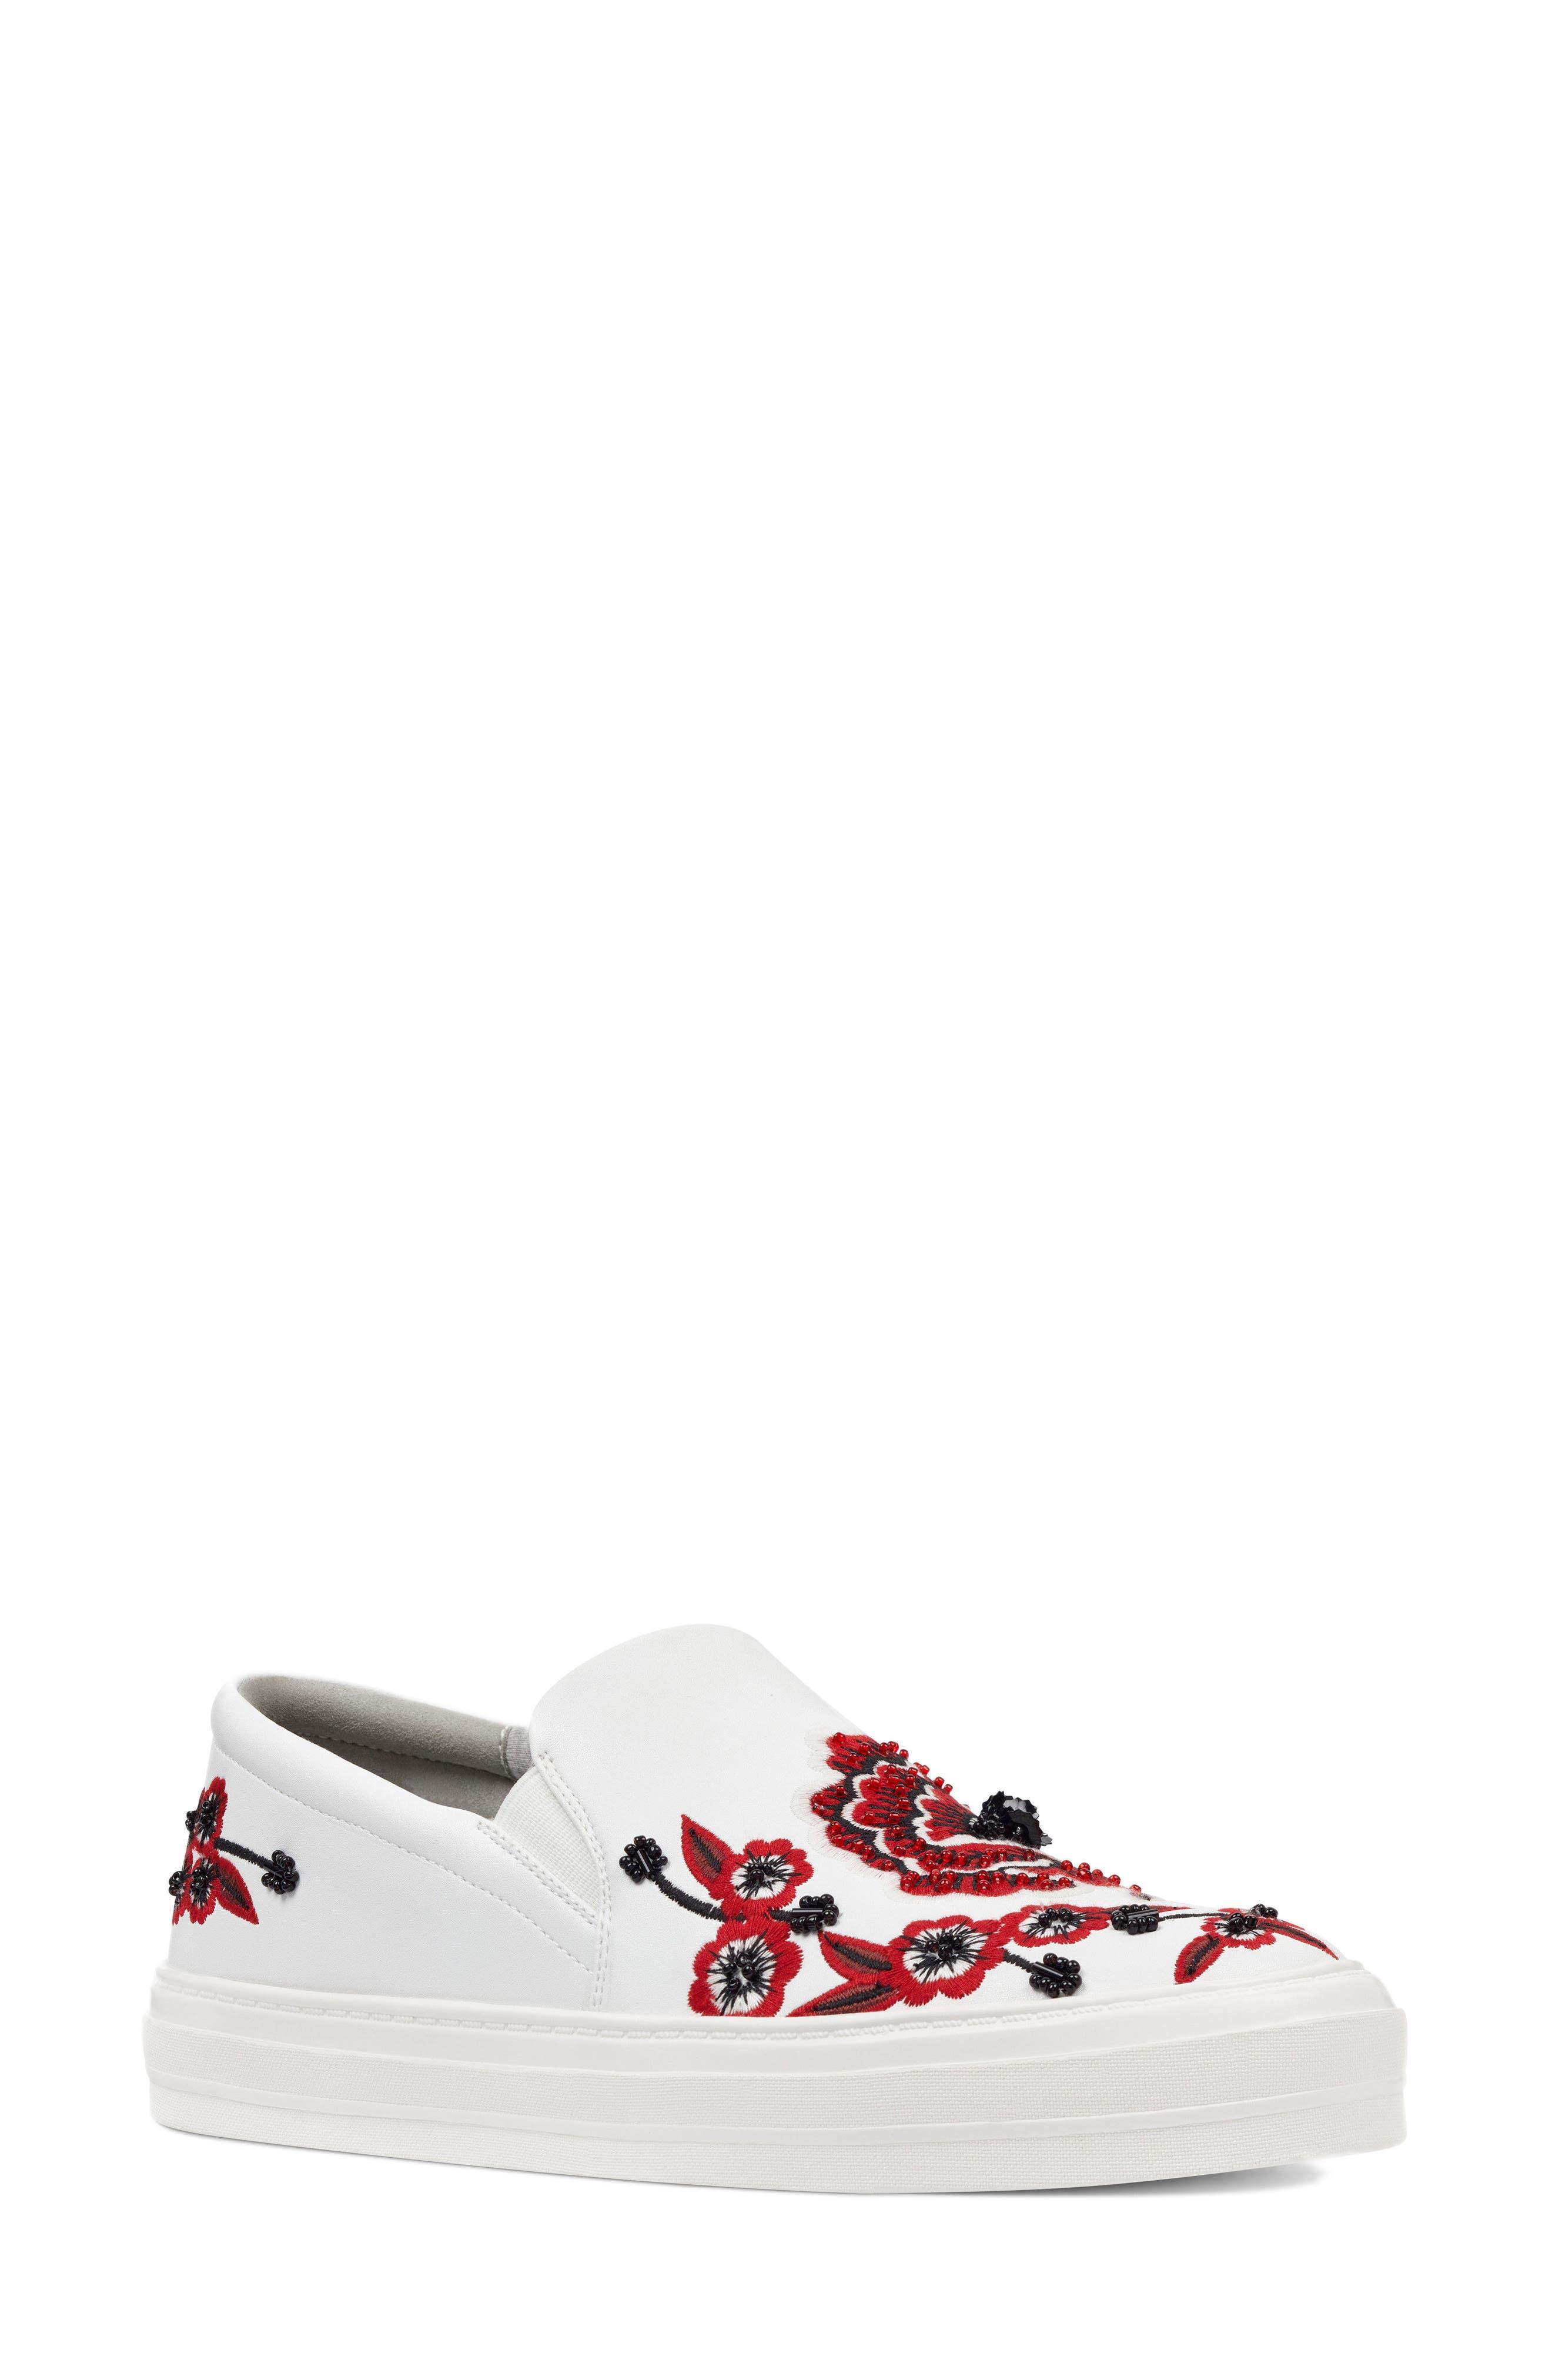 Main Image - Nine West Onyeka Embroidered Slip-On Sneaker (Women)